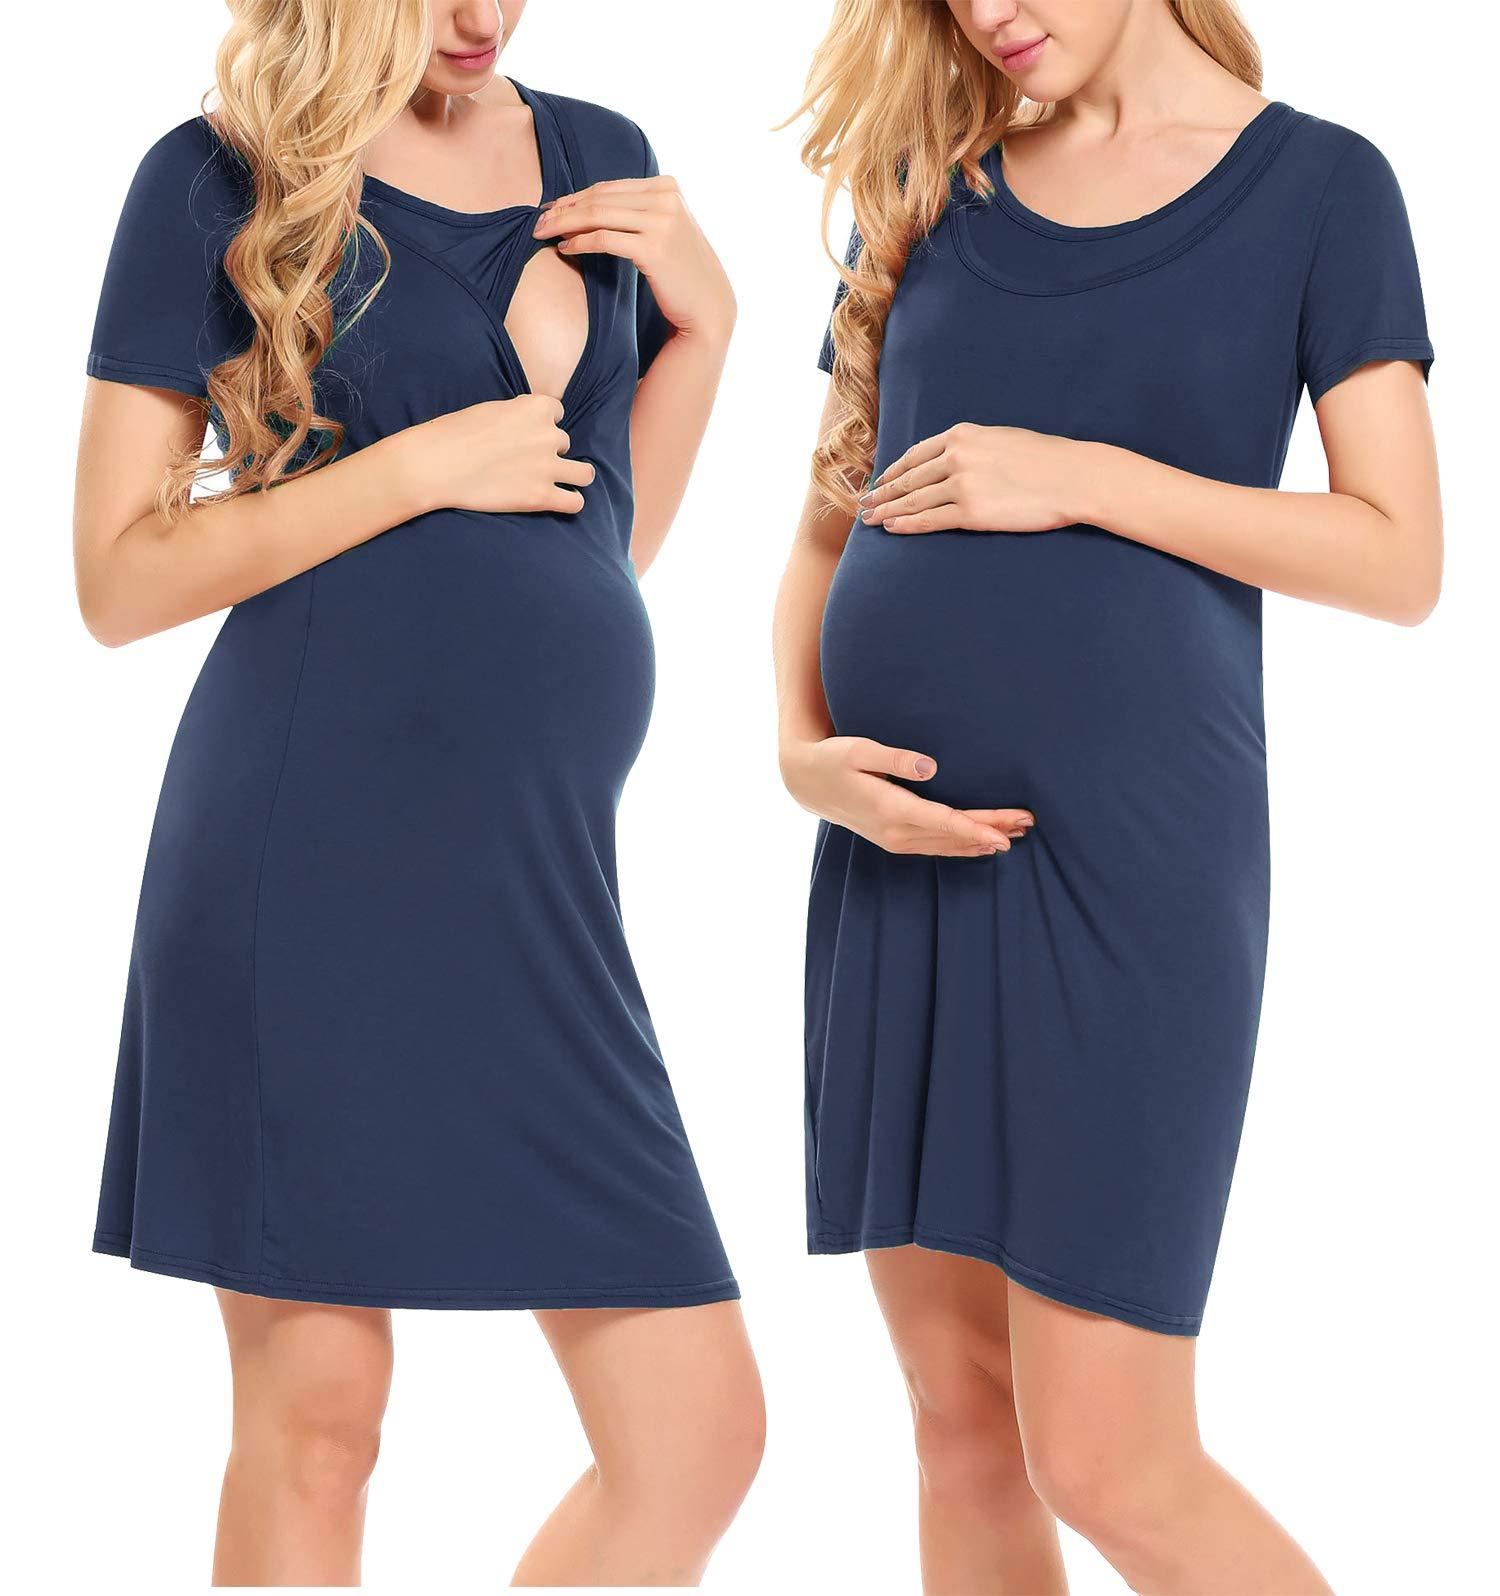 Hotouch Women's Nursing Nightgown for Breastfeeding Short Sleeve Hospital Gown Dress Sleepwear S-XXL